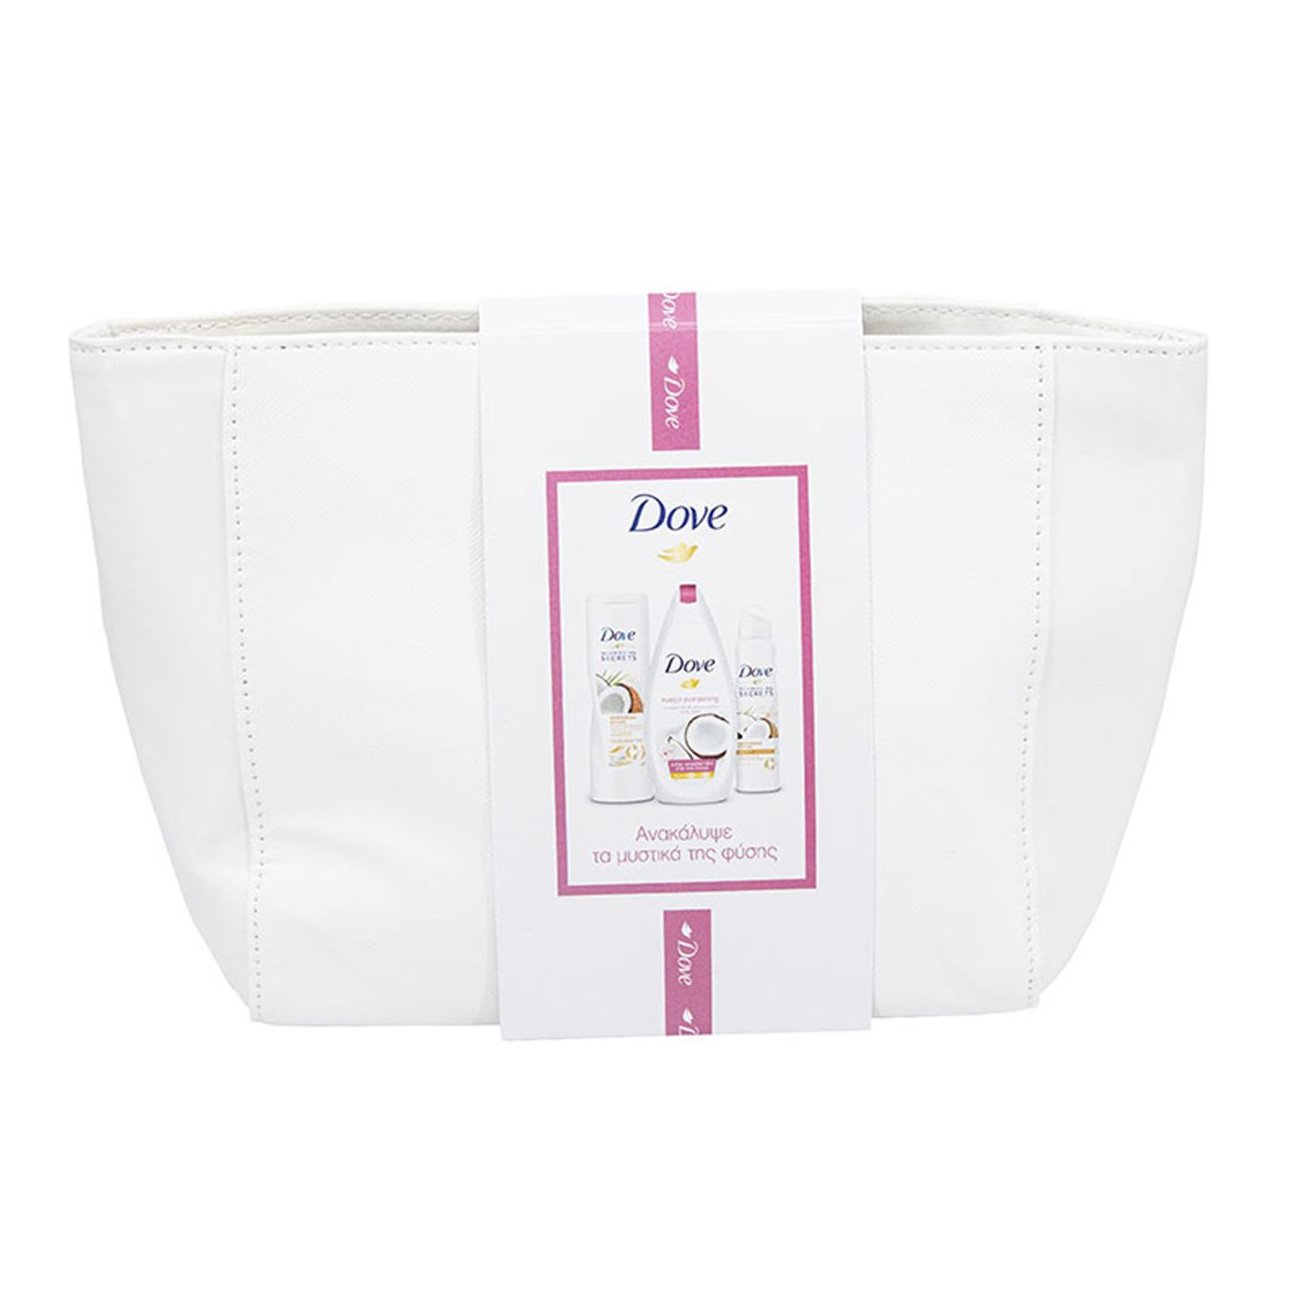 Dove Promo Purely Pampering Cocon Body Wash 250ml,Body Lotion 250ml,Anti-Transpirant 150ml Σειρά Περιποίησης Σώματος & Νεσεσέρ